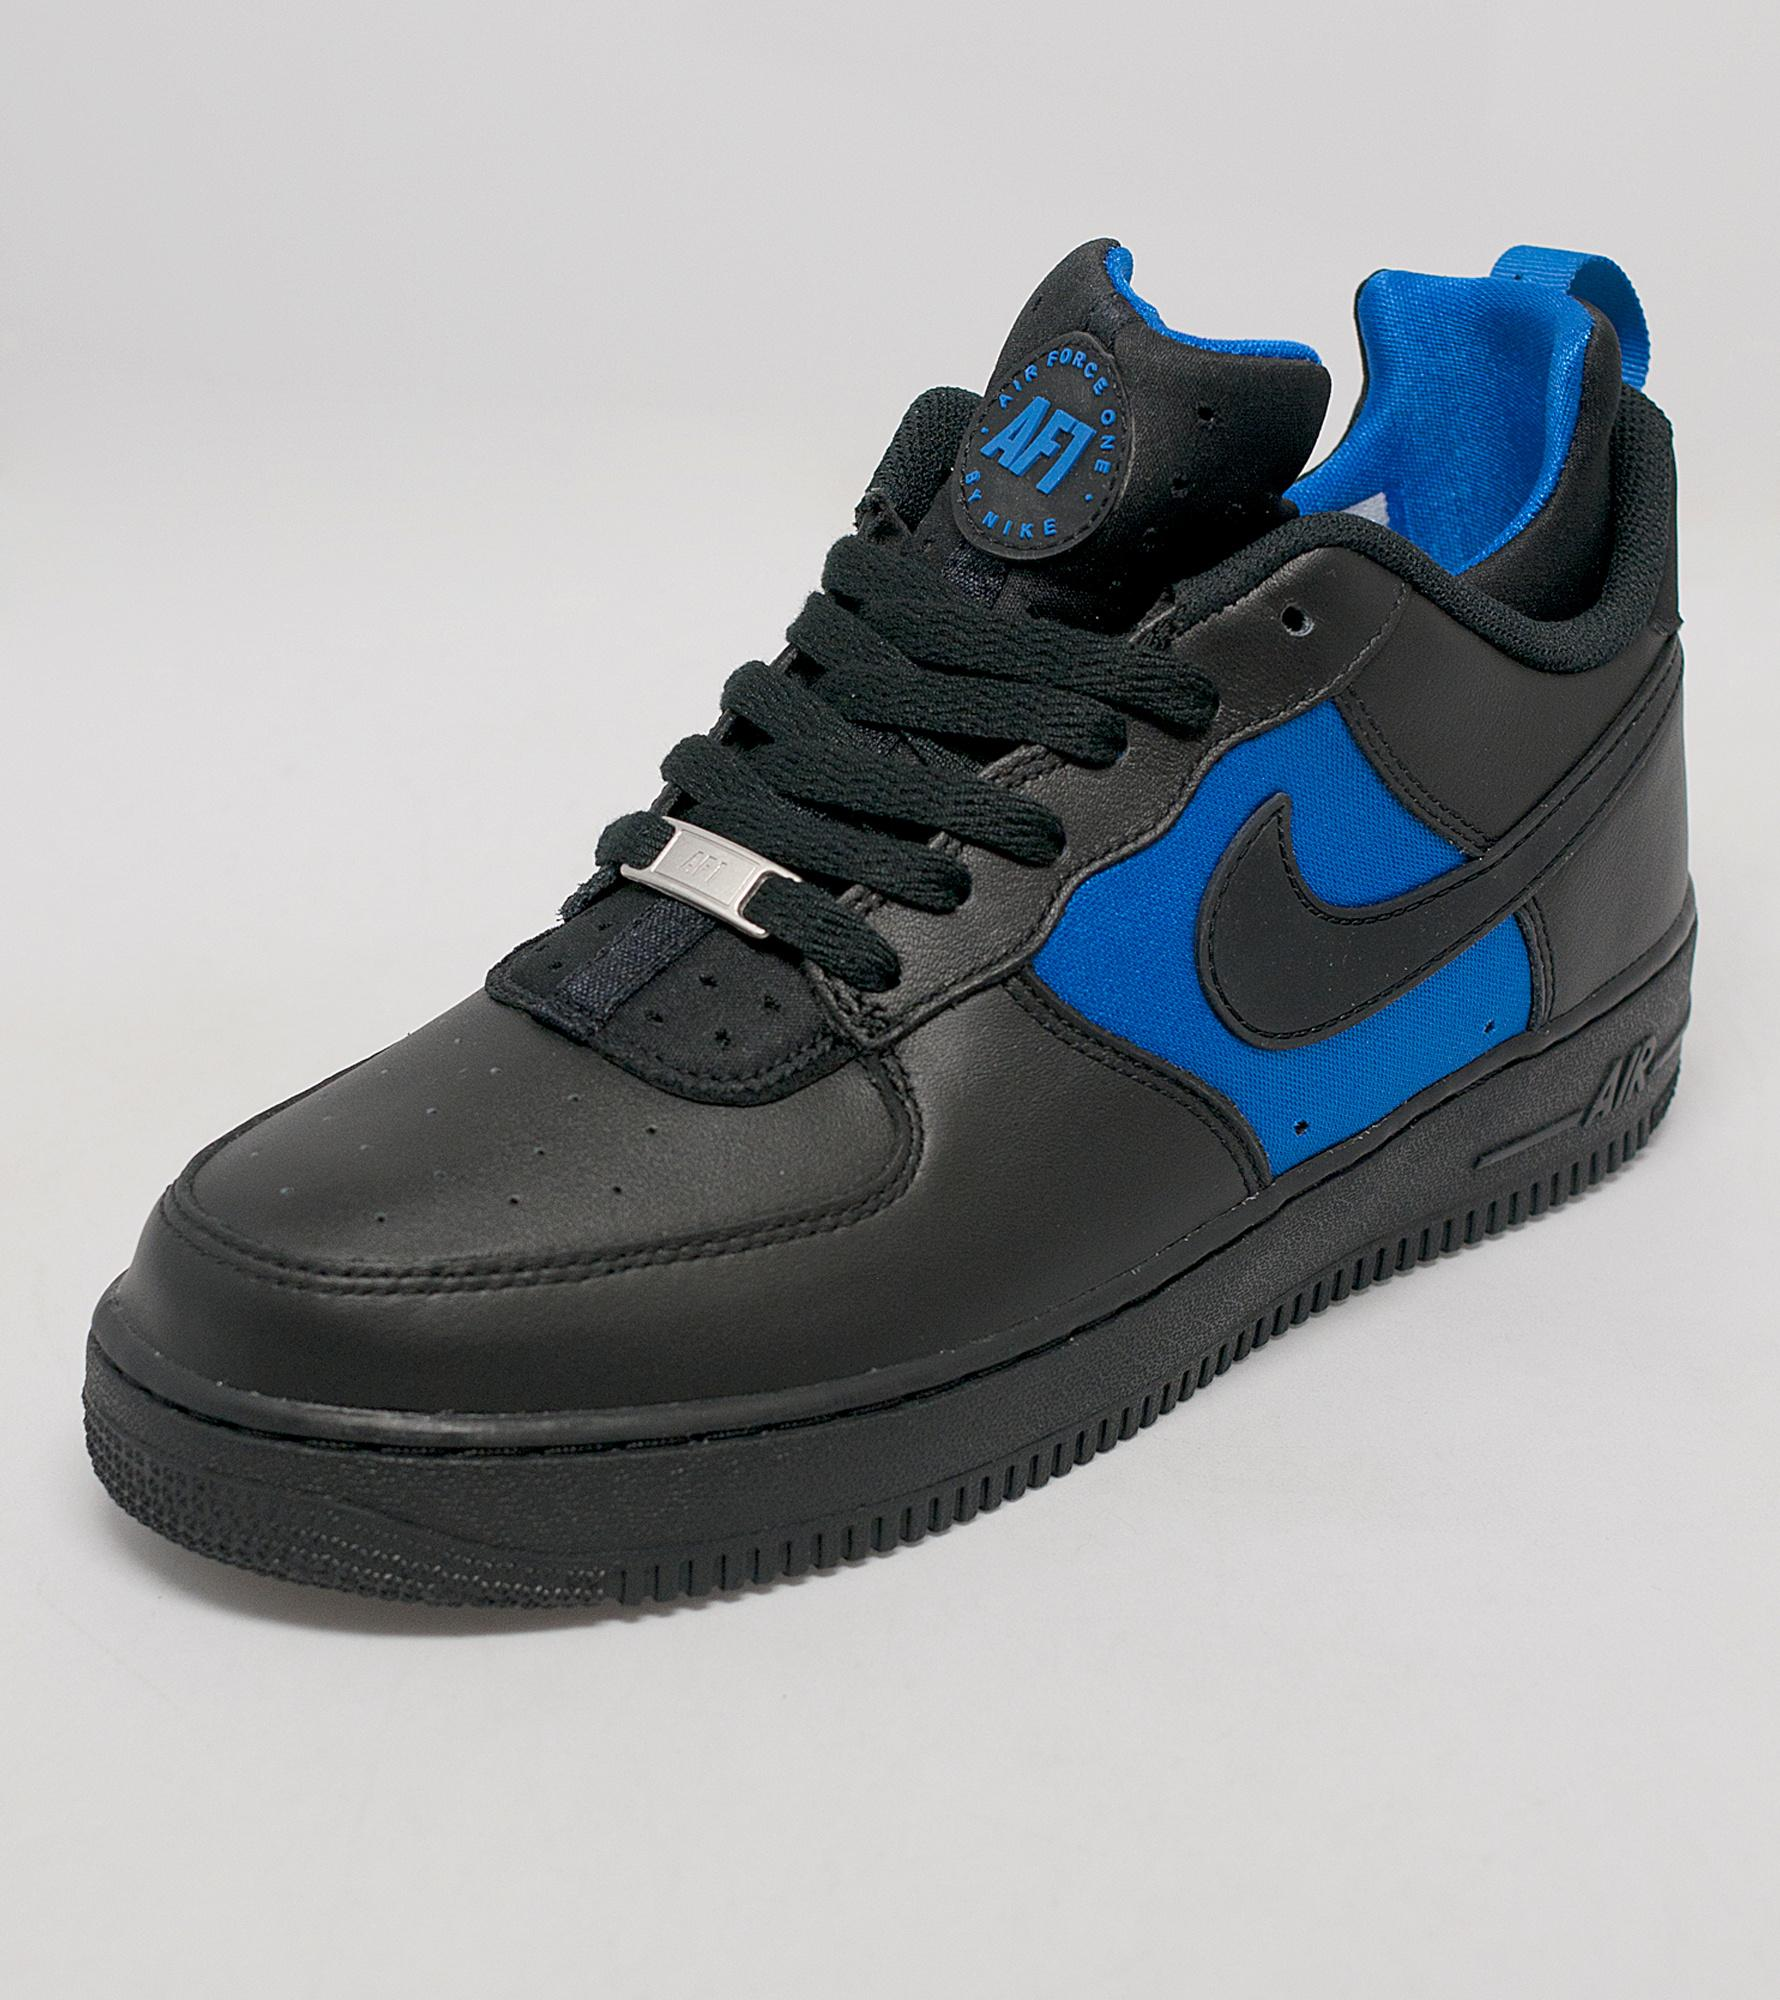 Huarache Nike Air Force